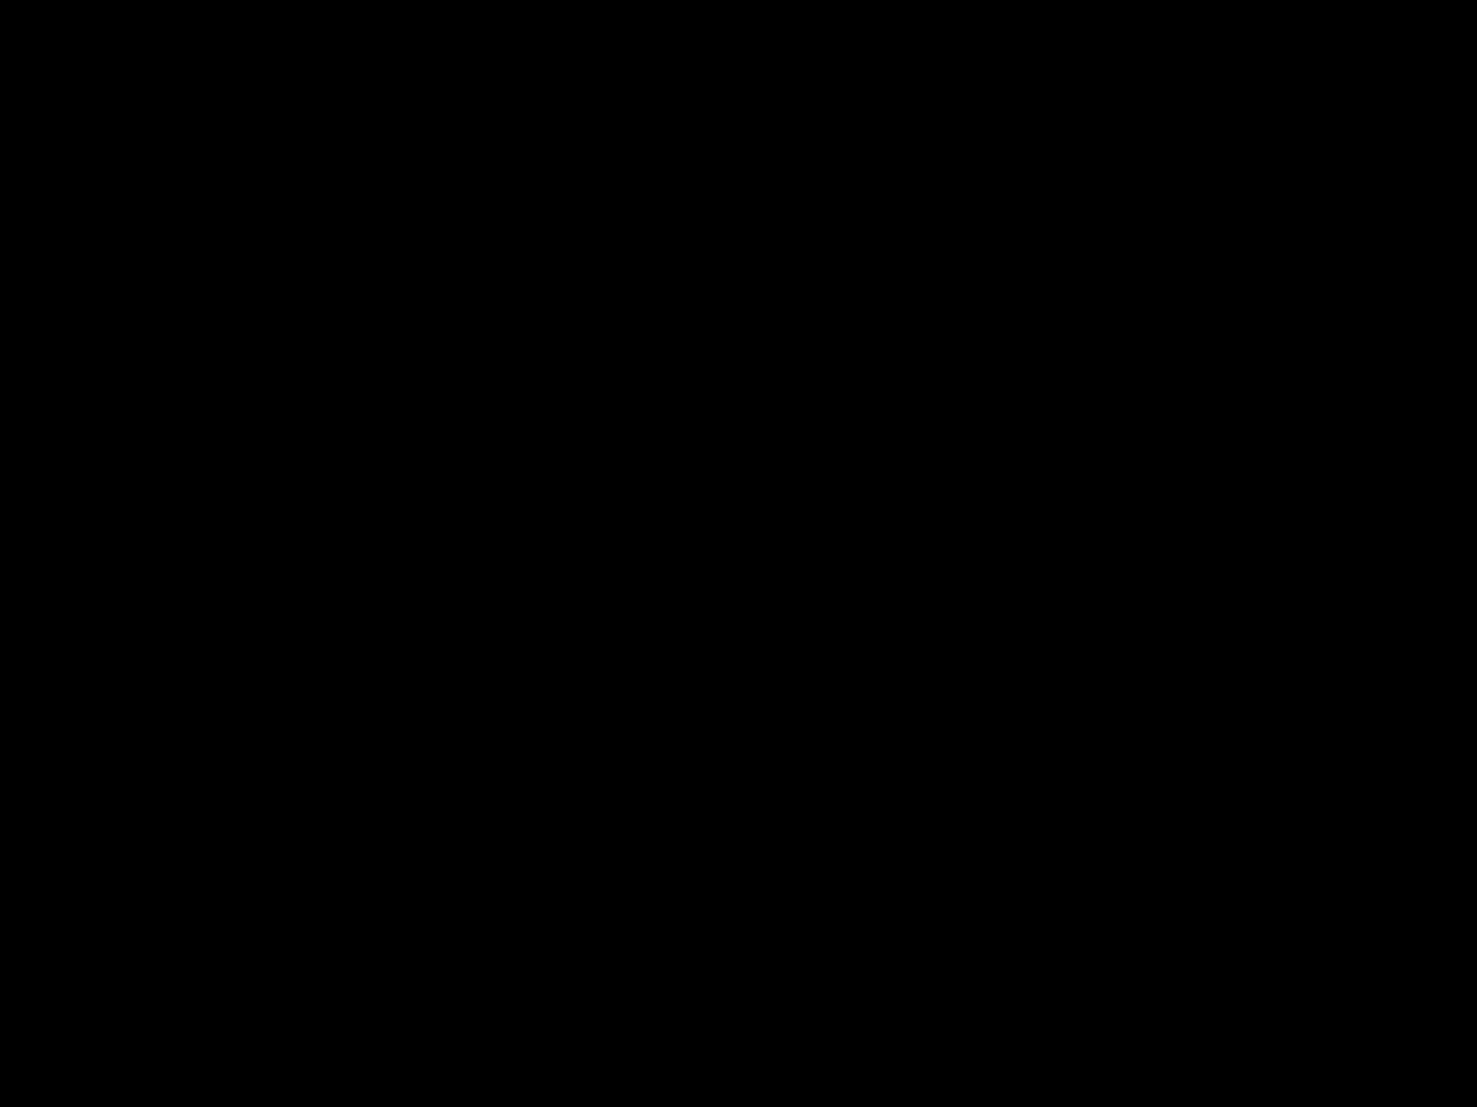 Sfântul Ierarh Dionisie Erhan, prăznuit în Basarabia